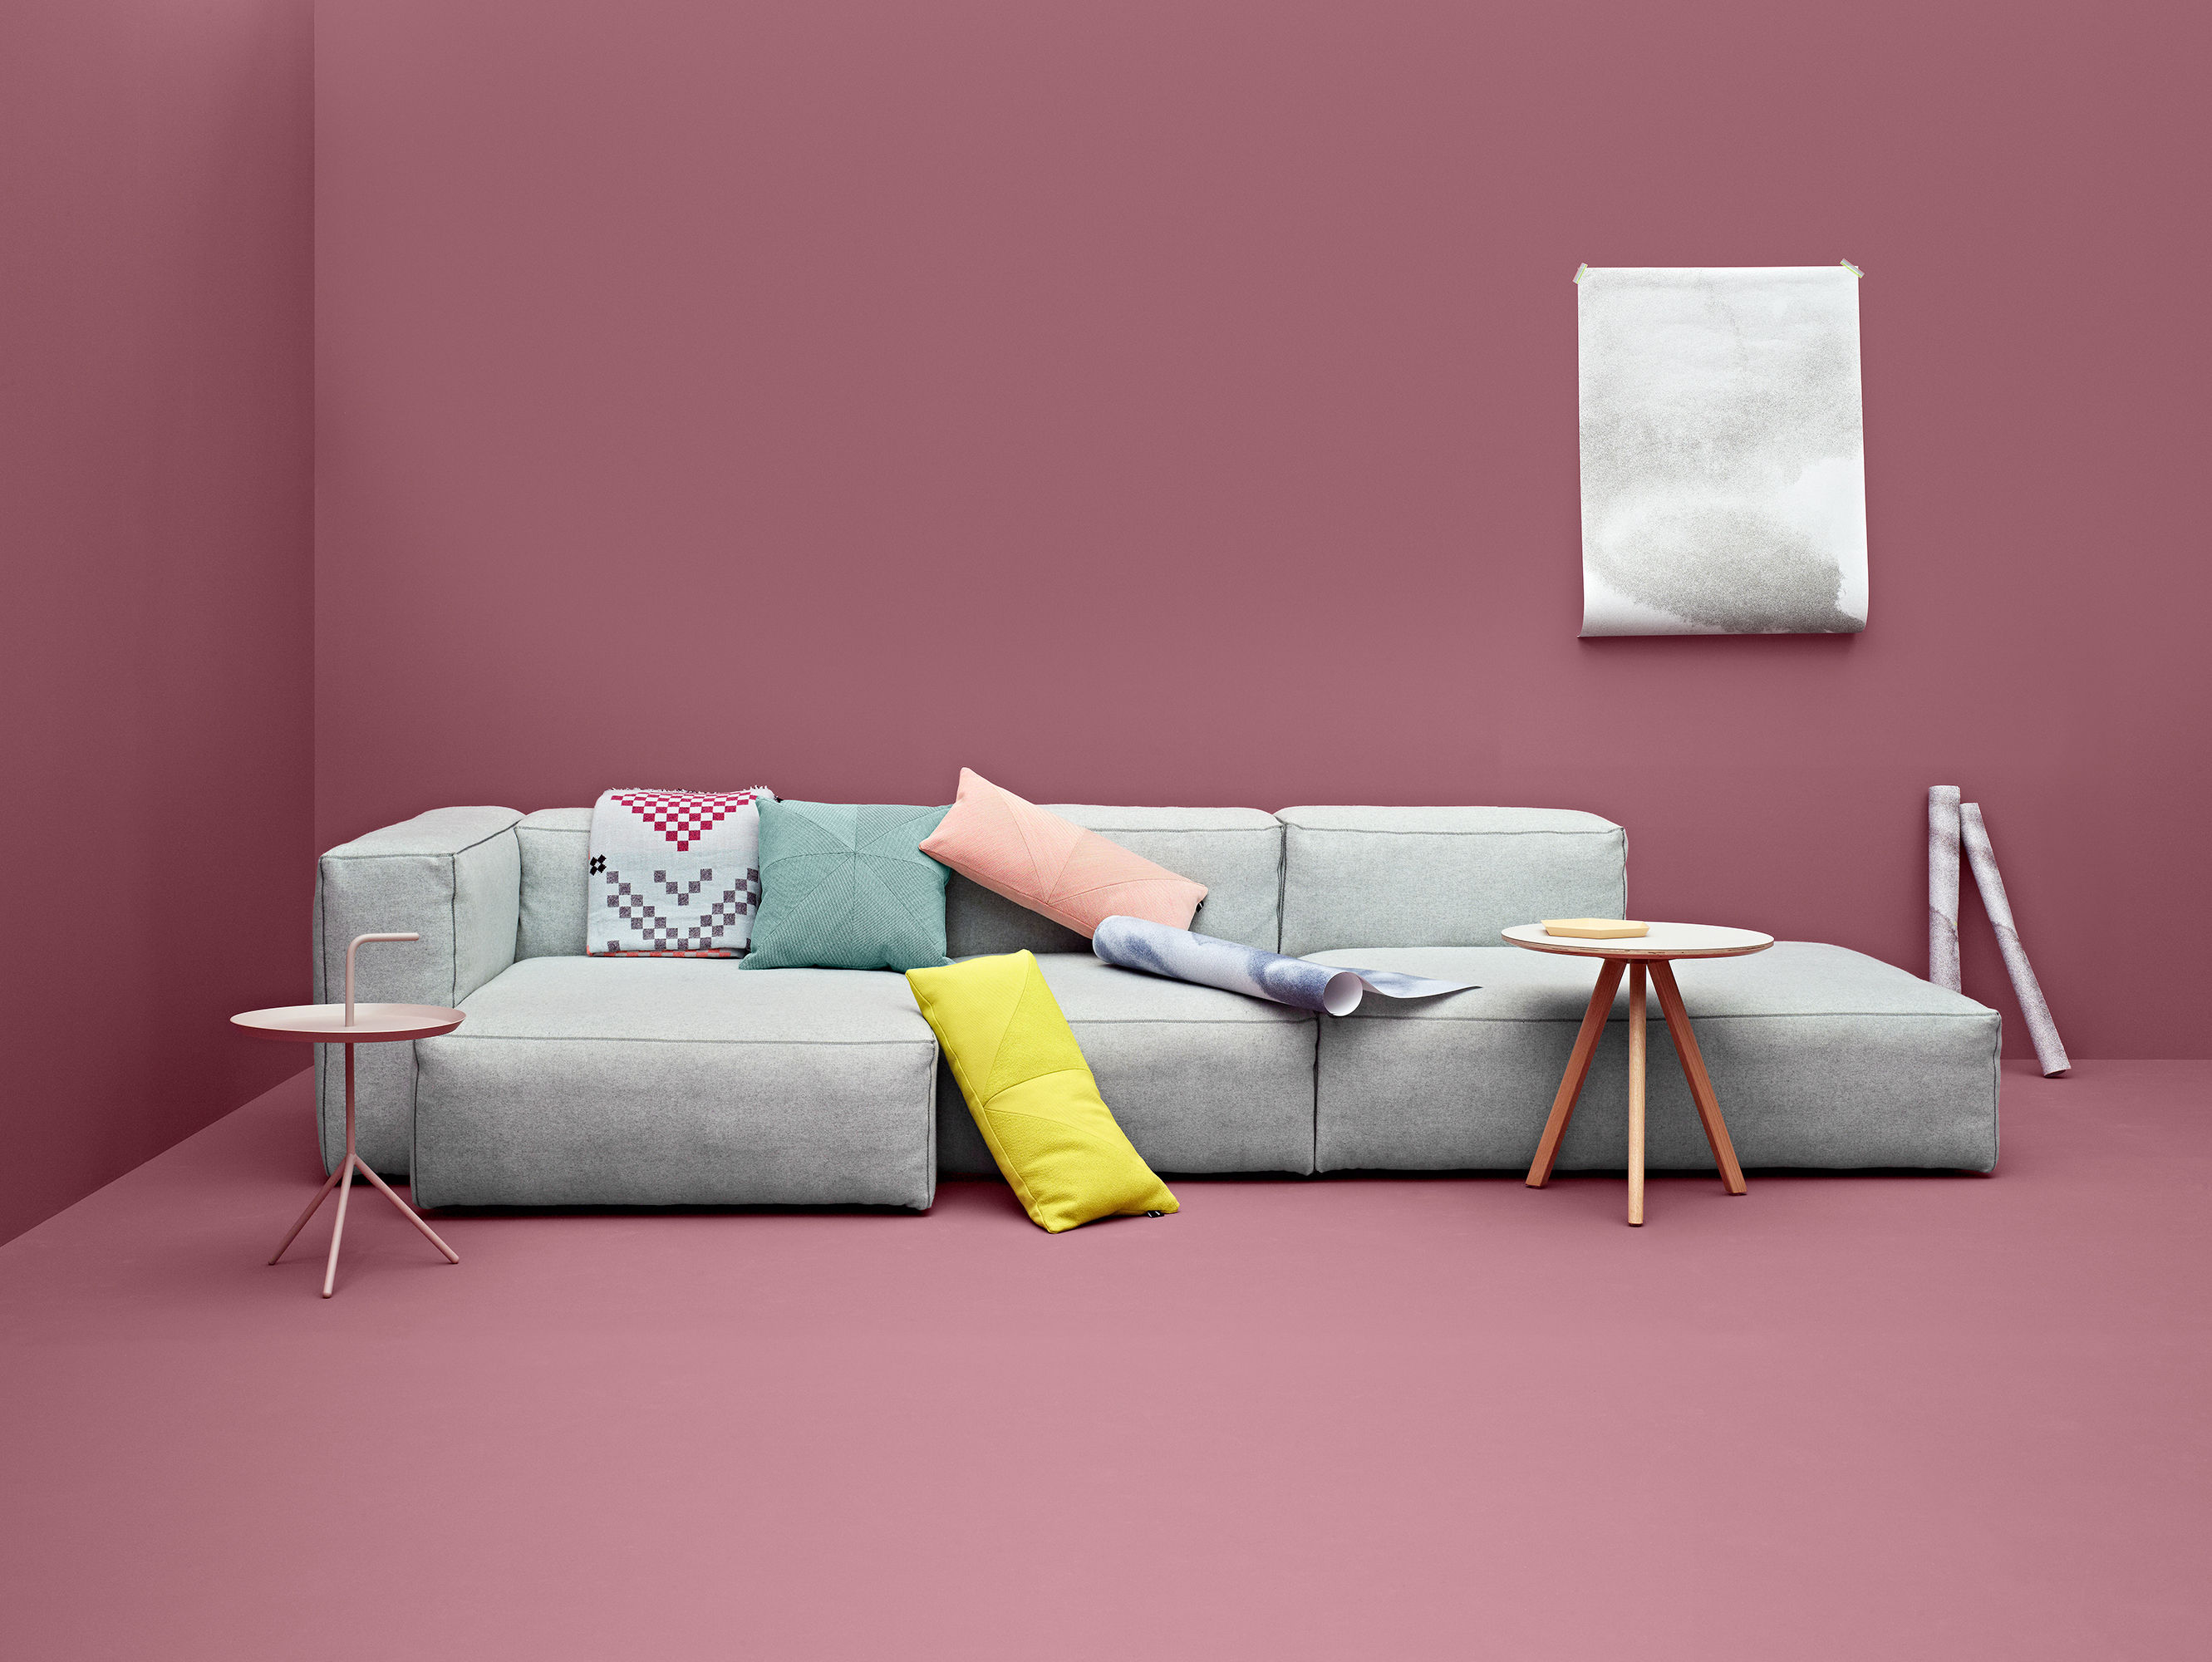 hay sofa kvadrat la z boy leather reclining soft mags corner left armrest l 302 cm light grey divina furniture sofas by